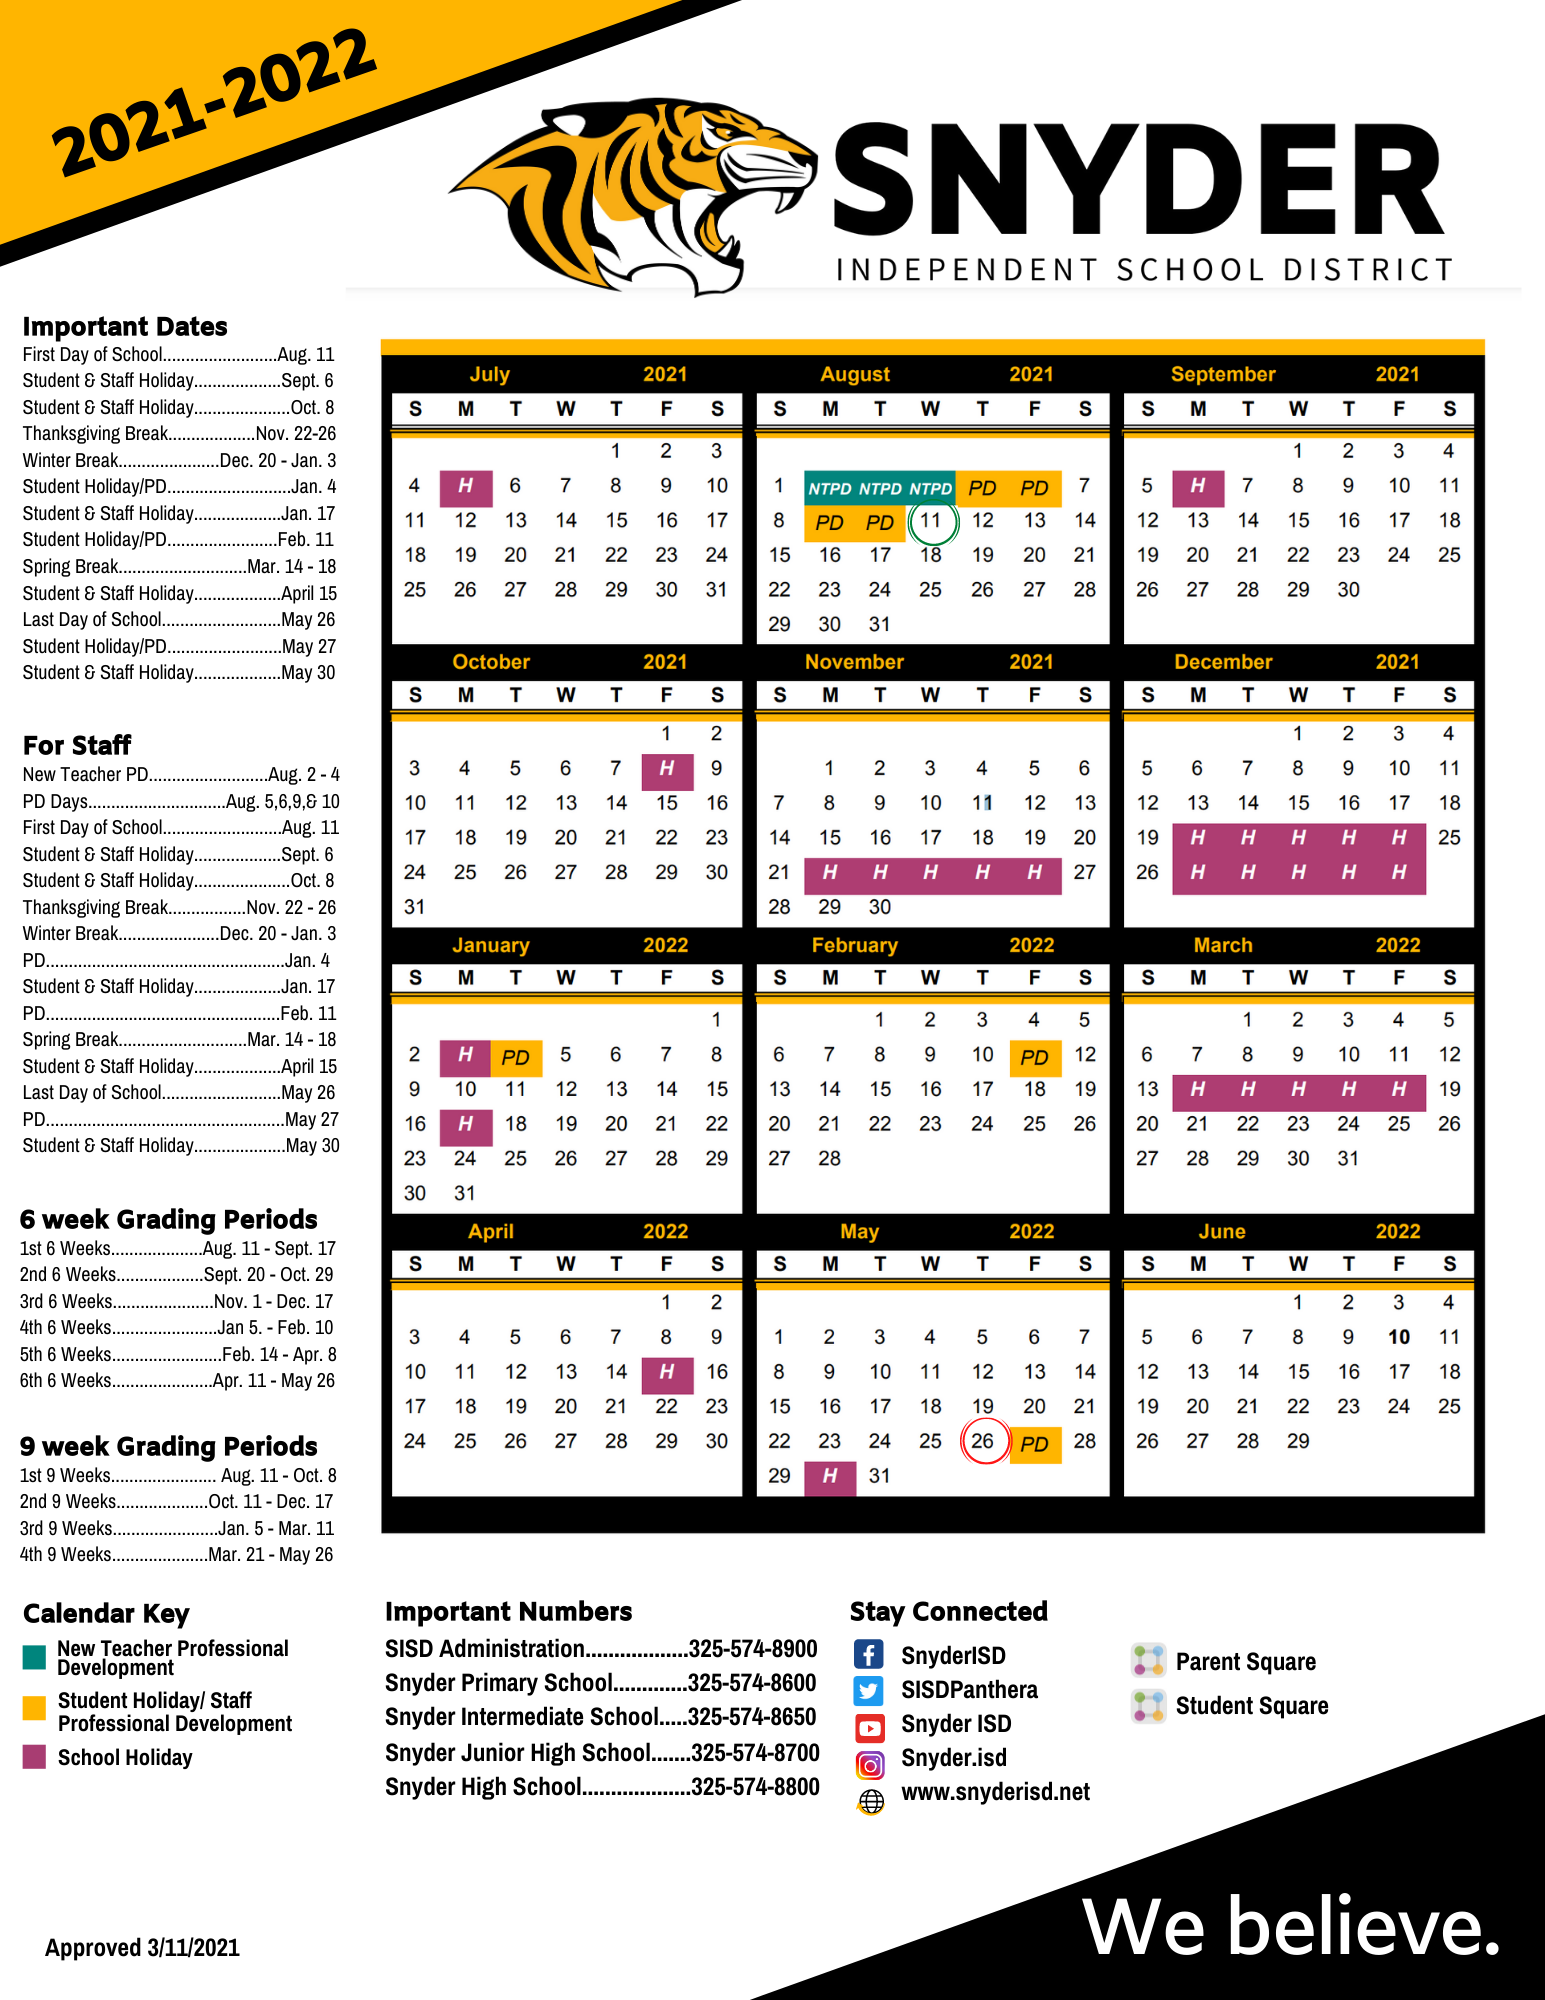 Cms Calendar 2022.2021 2022 District Calendar Snyder Isd